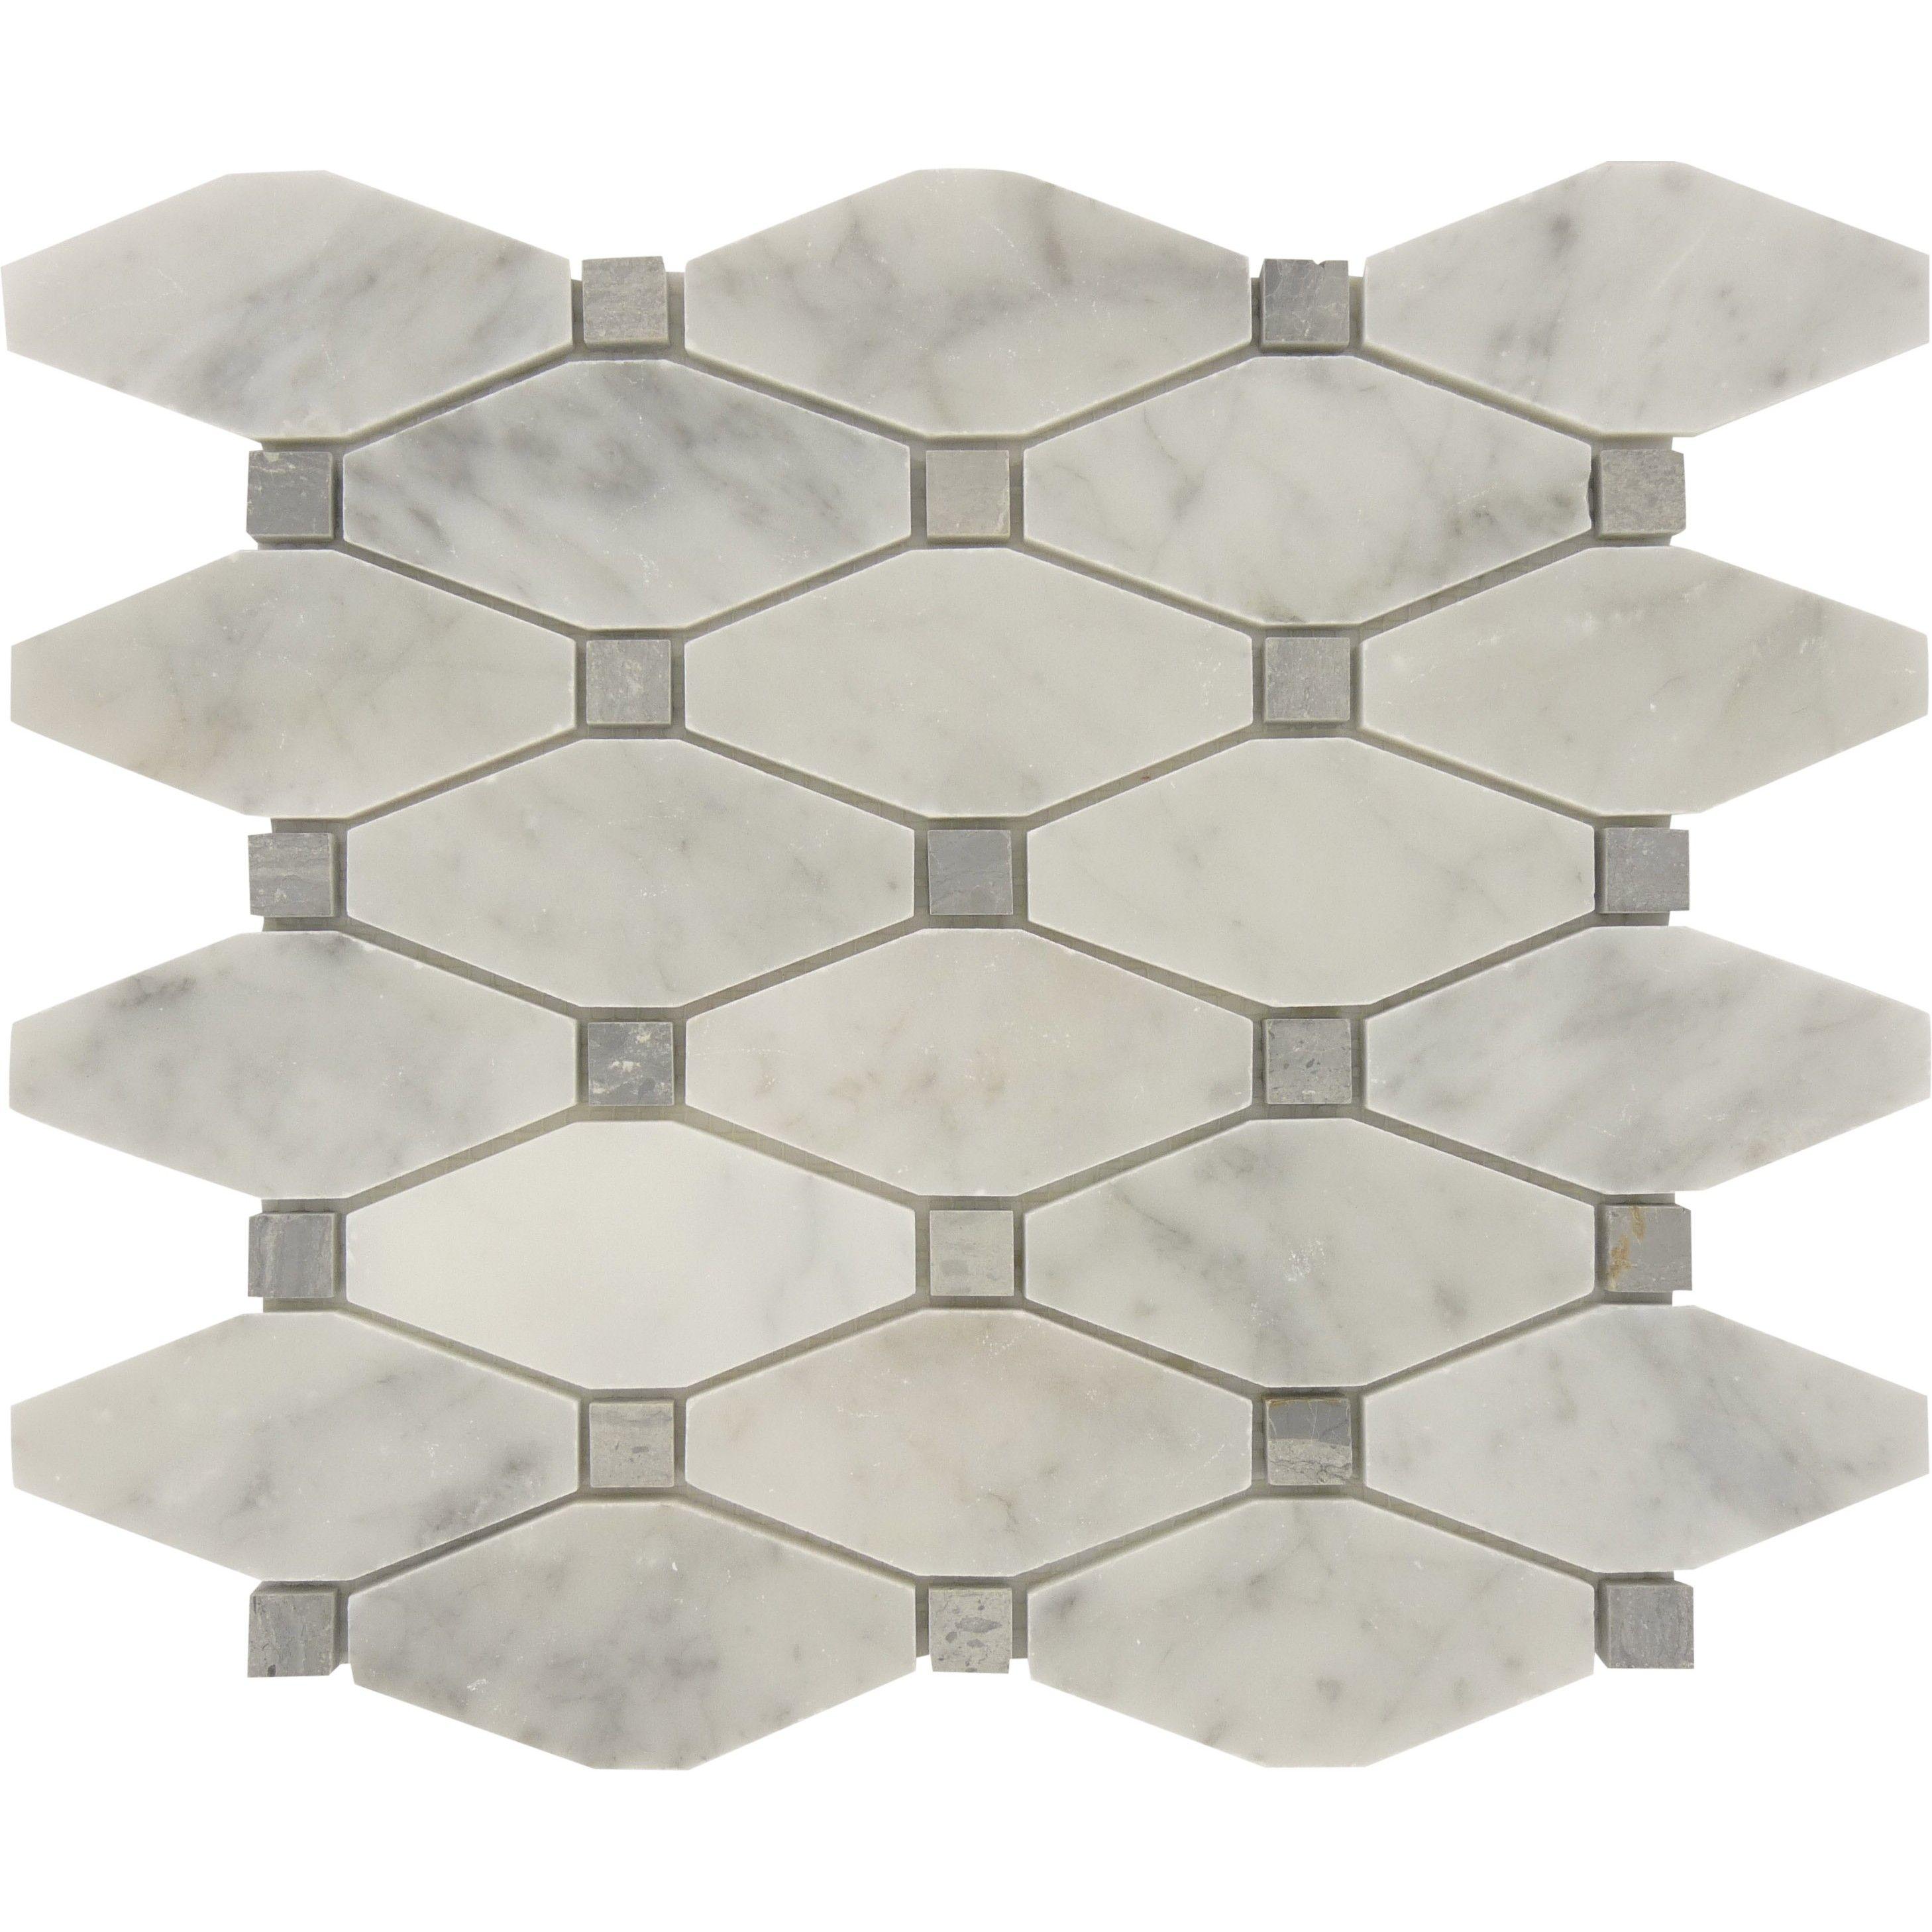 "Sheet Size: 10 1/2"" X 12"" Tile Size: Variable Tile"